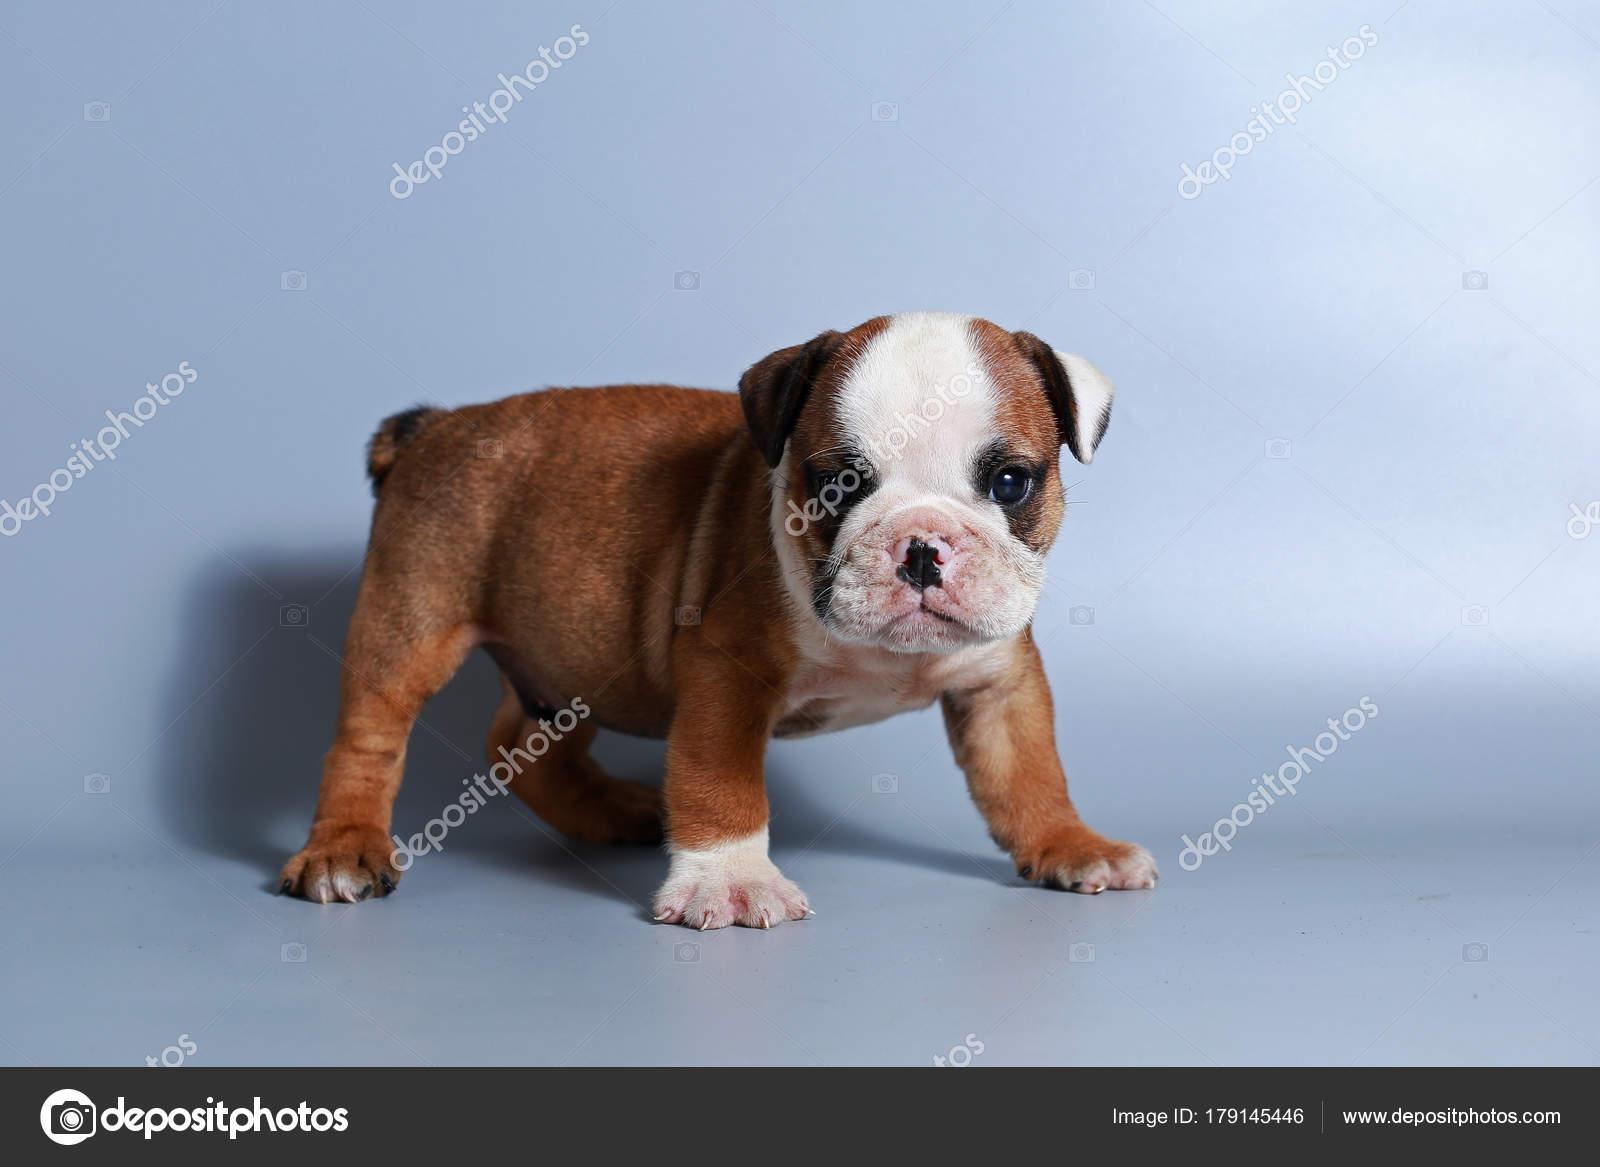 Month Purebred English Bulldog Puppy Gray Screen Stock Photo C S Thanawathreborn Gmail Com 179145446